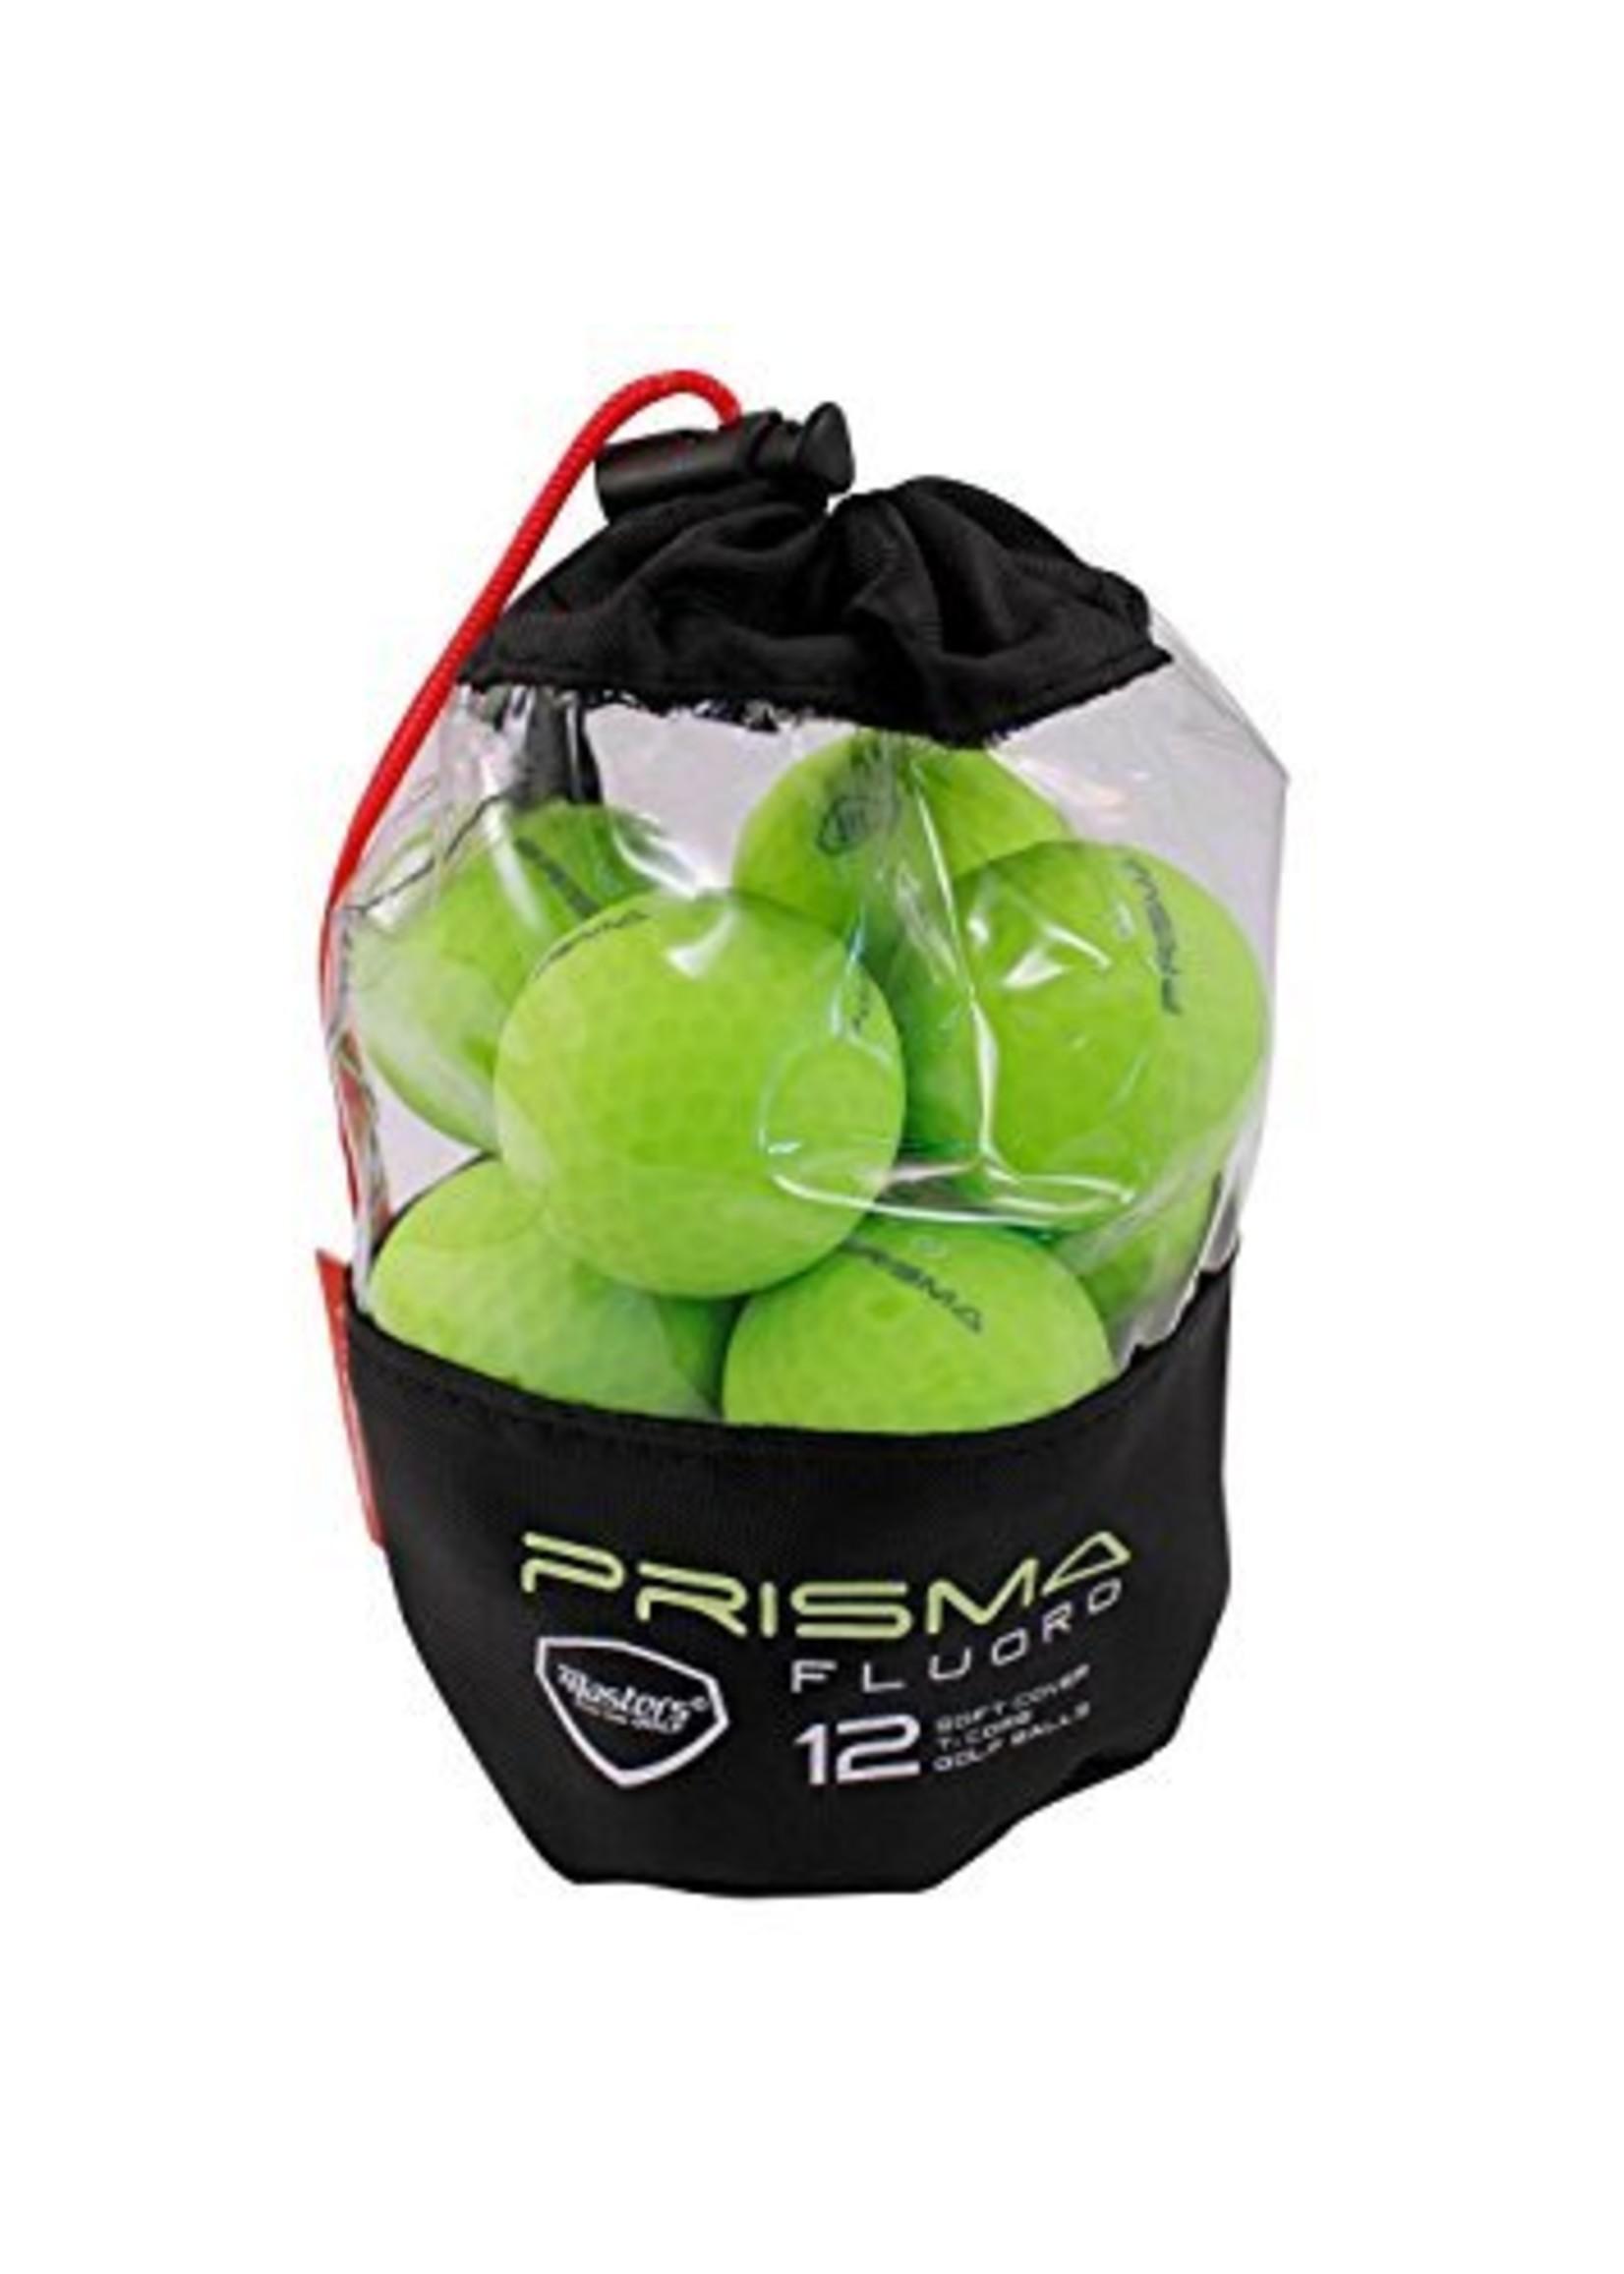 Masters Prisma Fluoro Matte TI Golf Balls